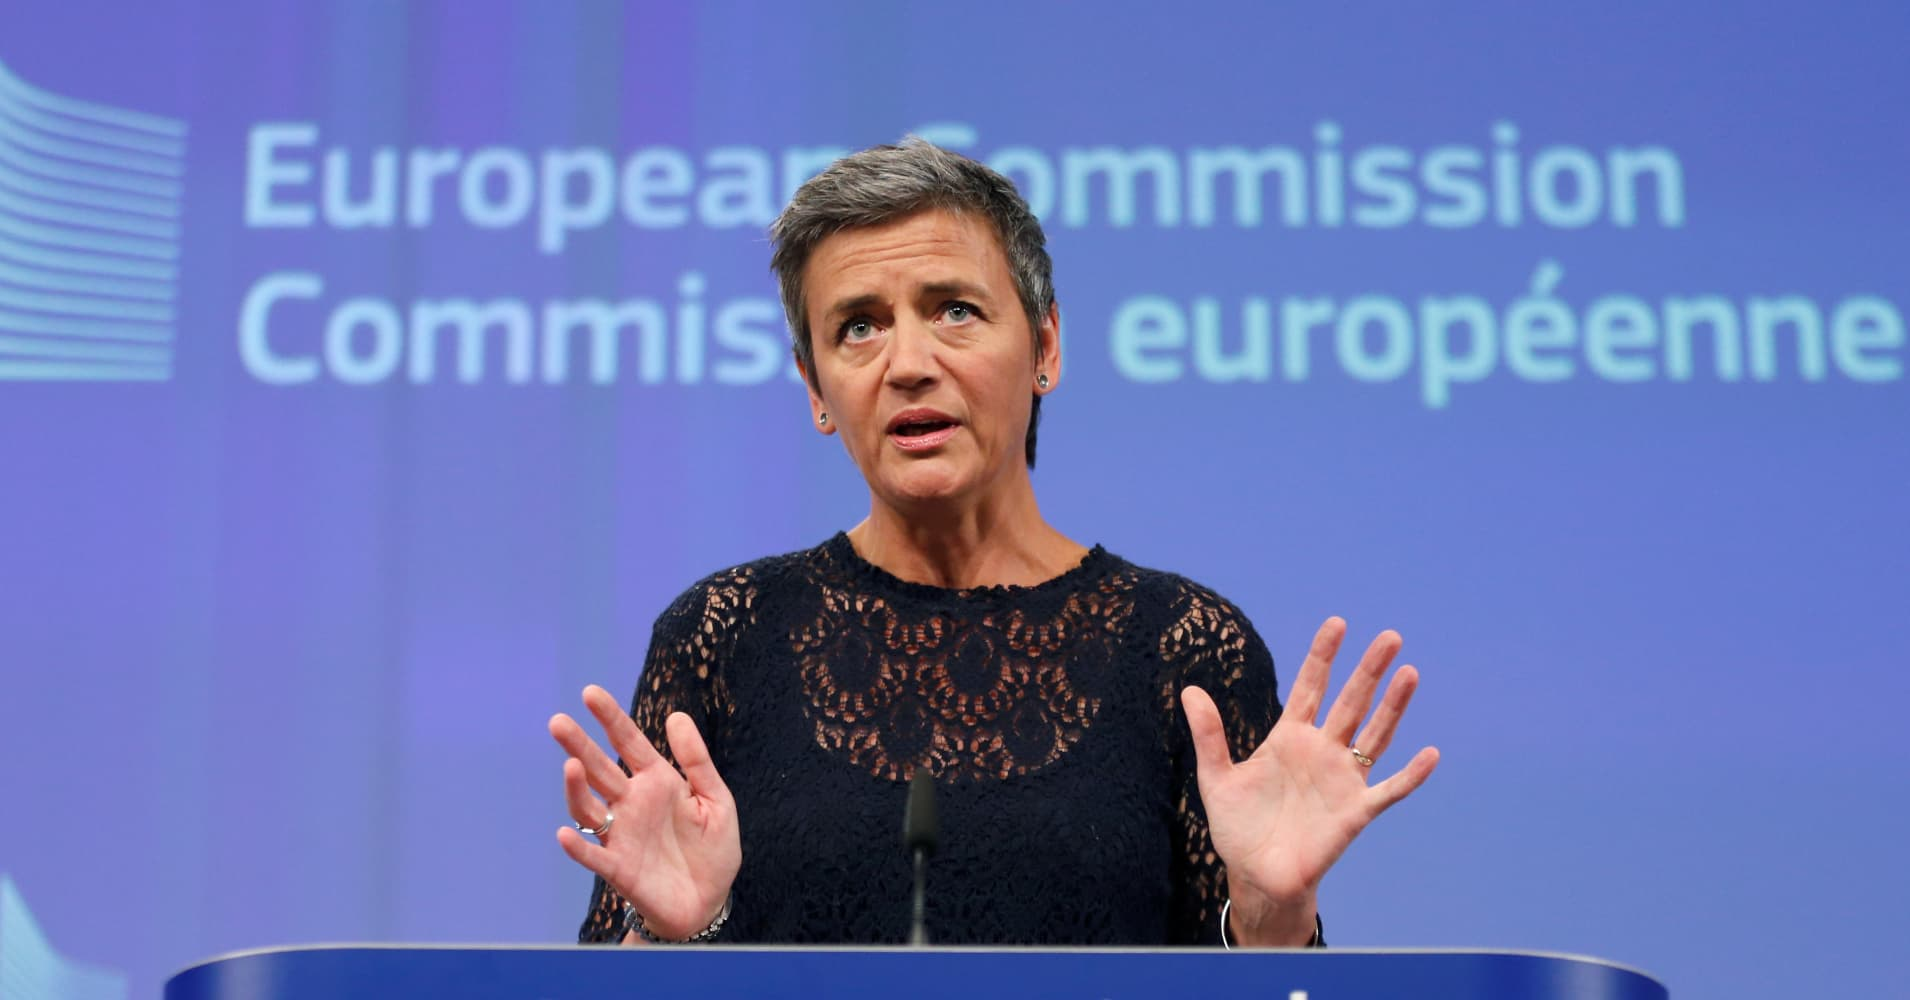 Google still a 'wonderful' company, says EU's top antitrust enforcer after $2.7 billion fine